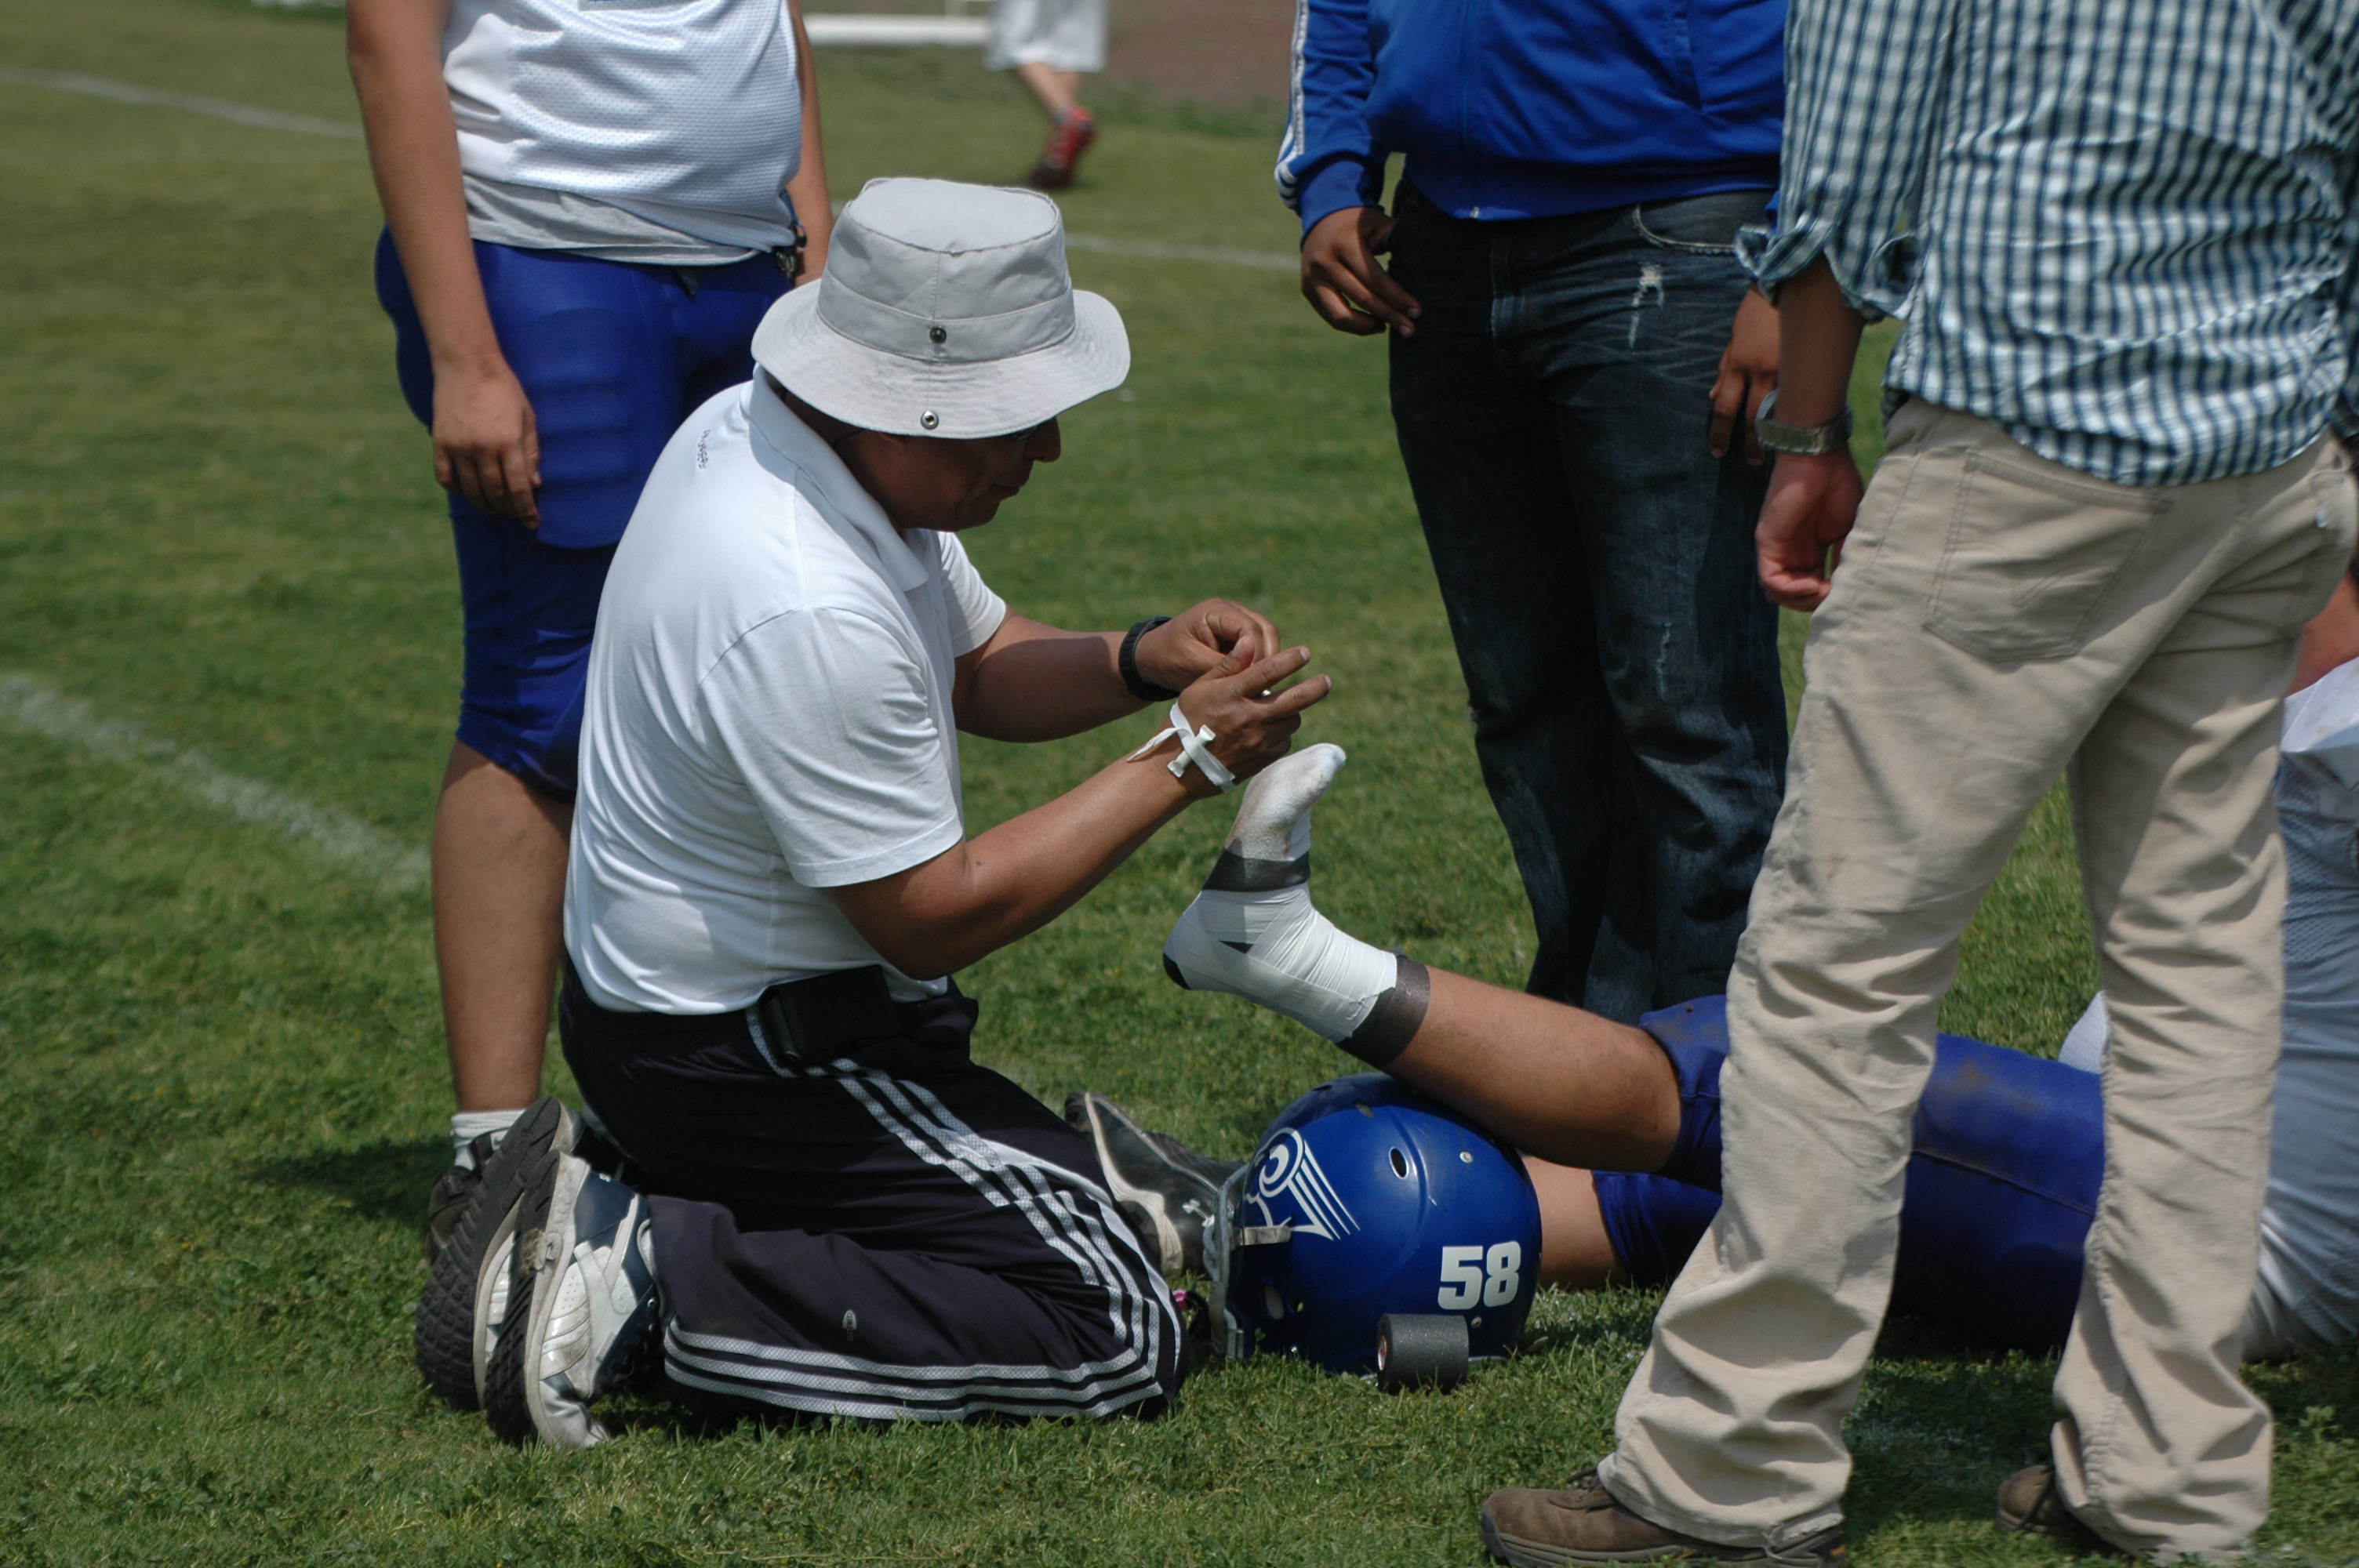 Sports injury wikipedia . Hurt clipart injured athlete